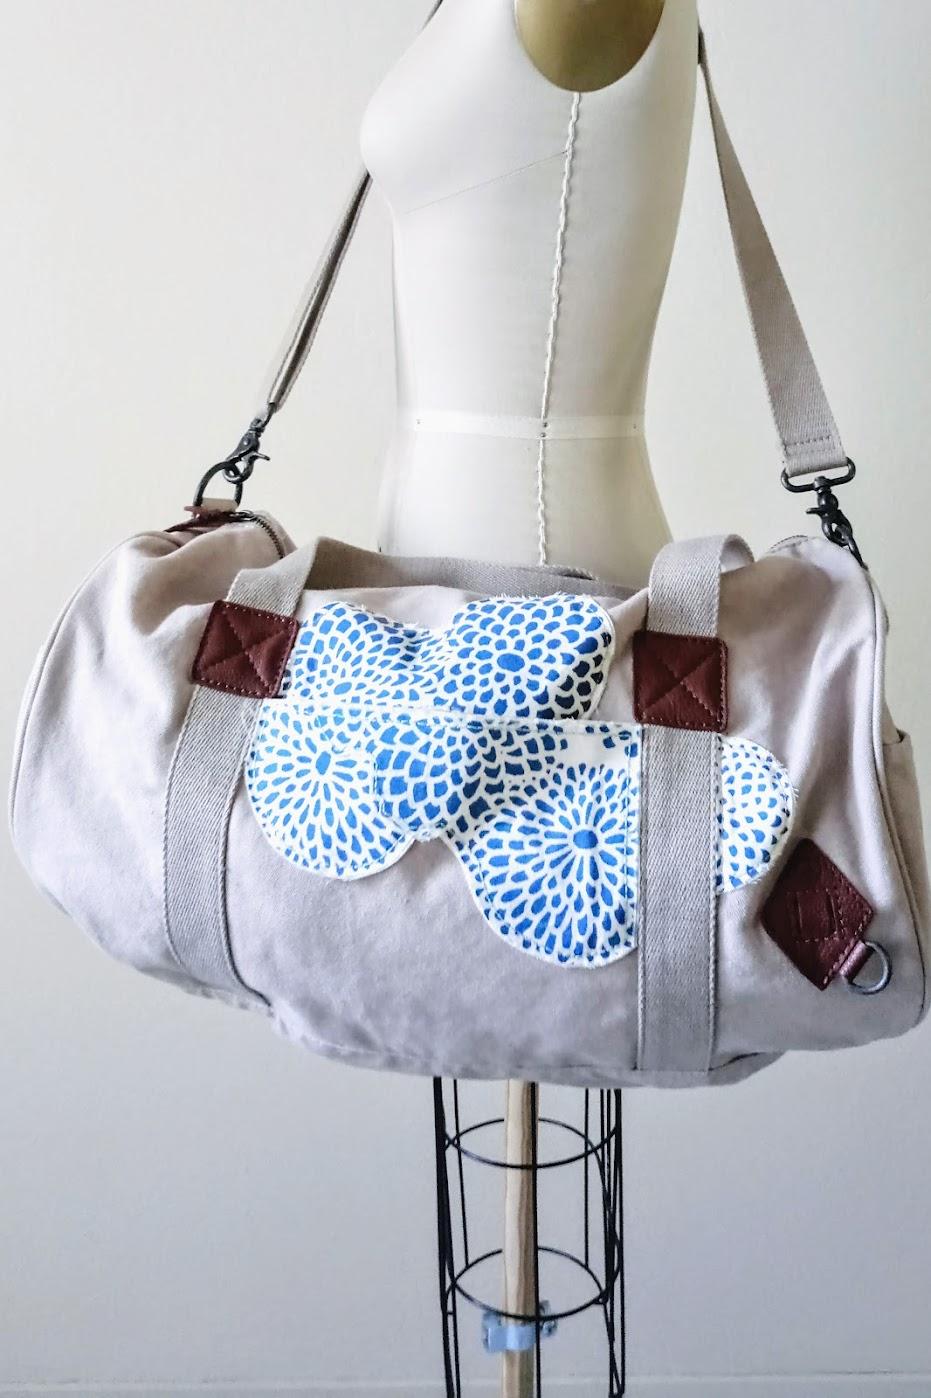 Appliqué Duffle Bag Project - DIY Fashion Accessories | fafafoom.com